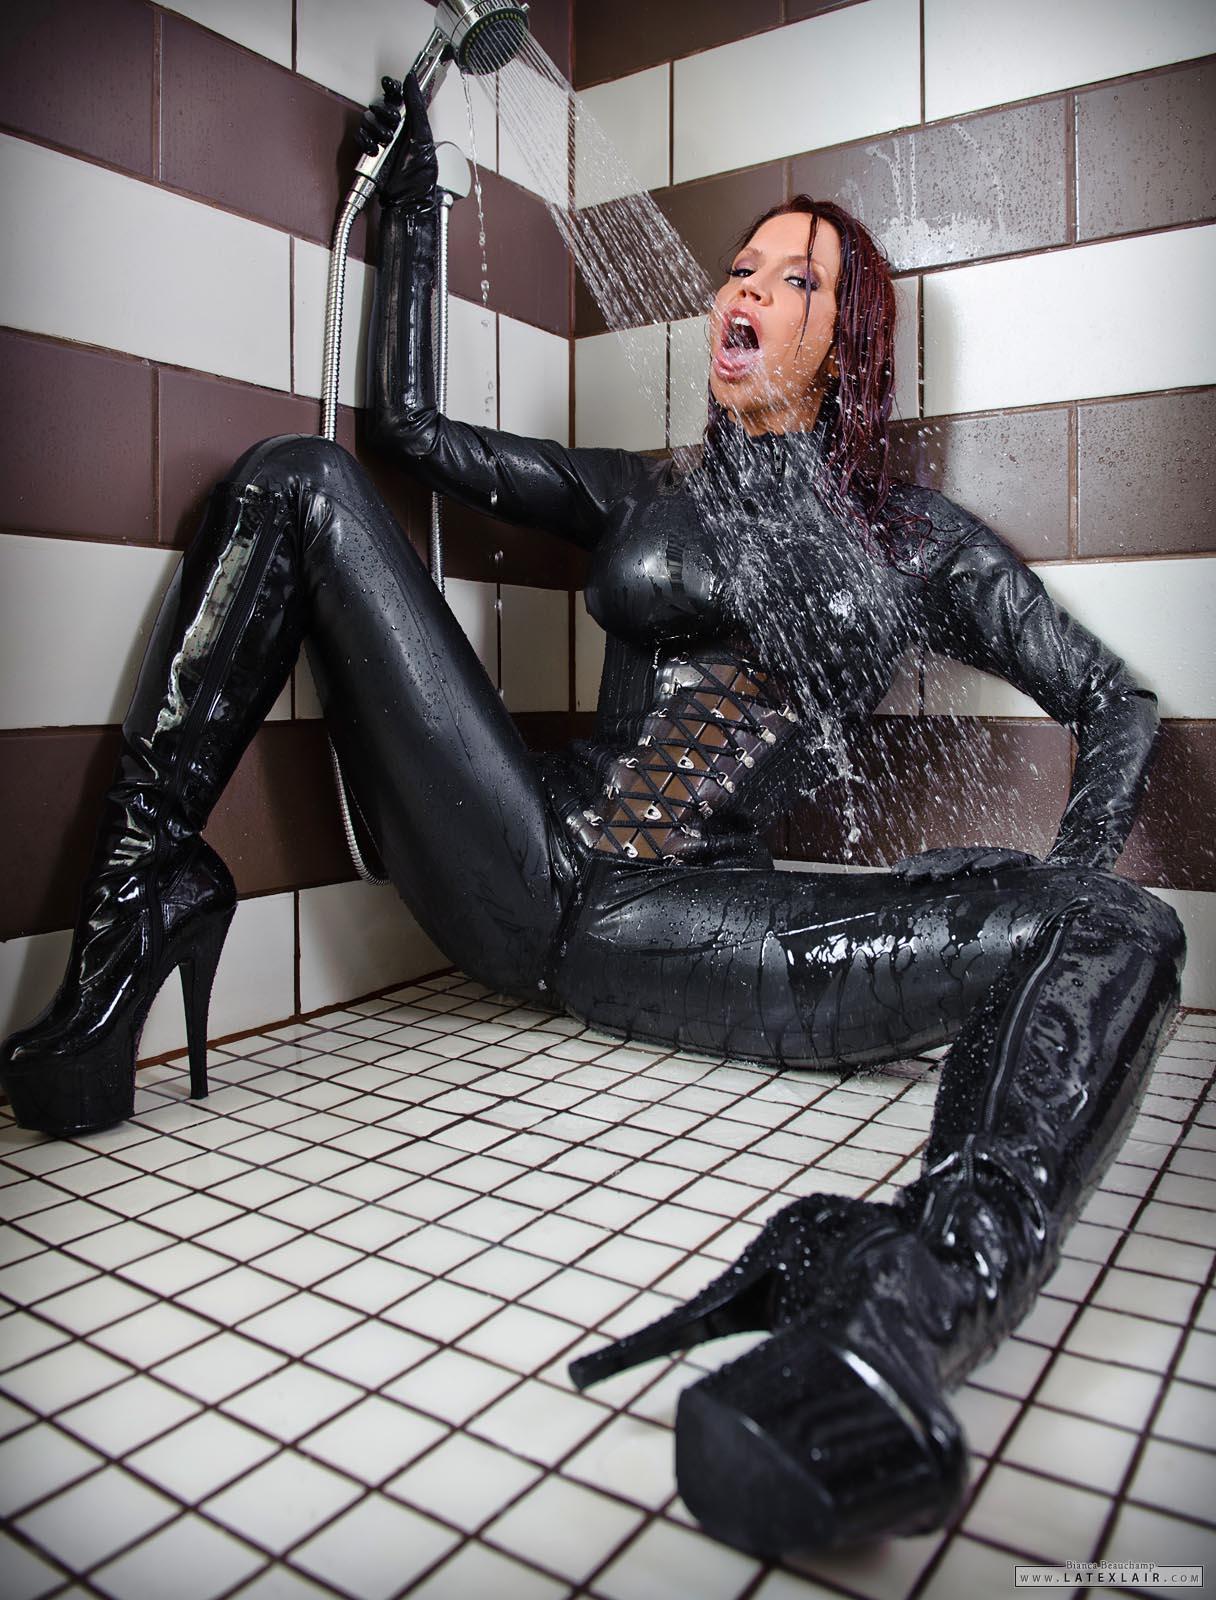 bianca beauchamp wet shower wetlook